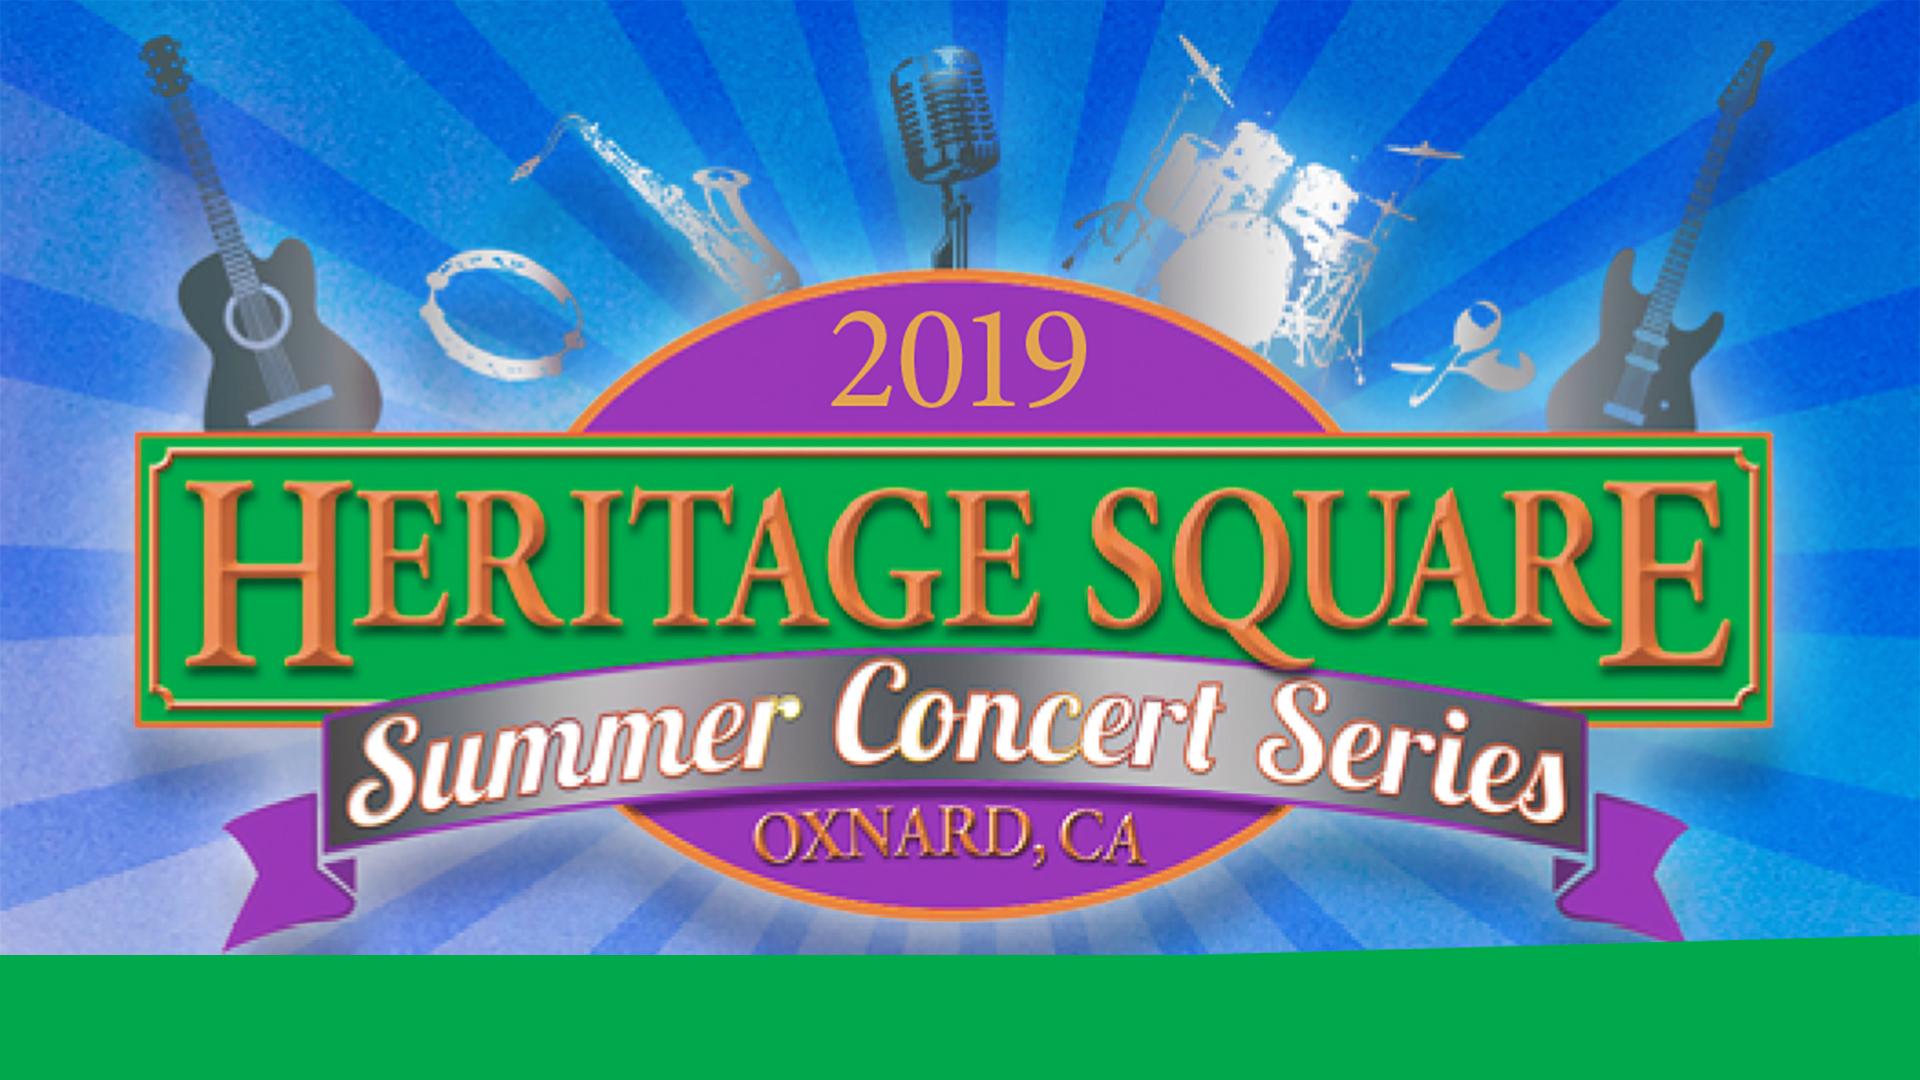 Heritage Square Summer Concert Series – Decadent Decades